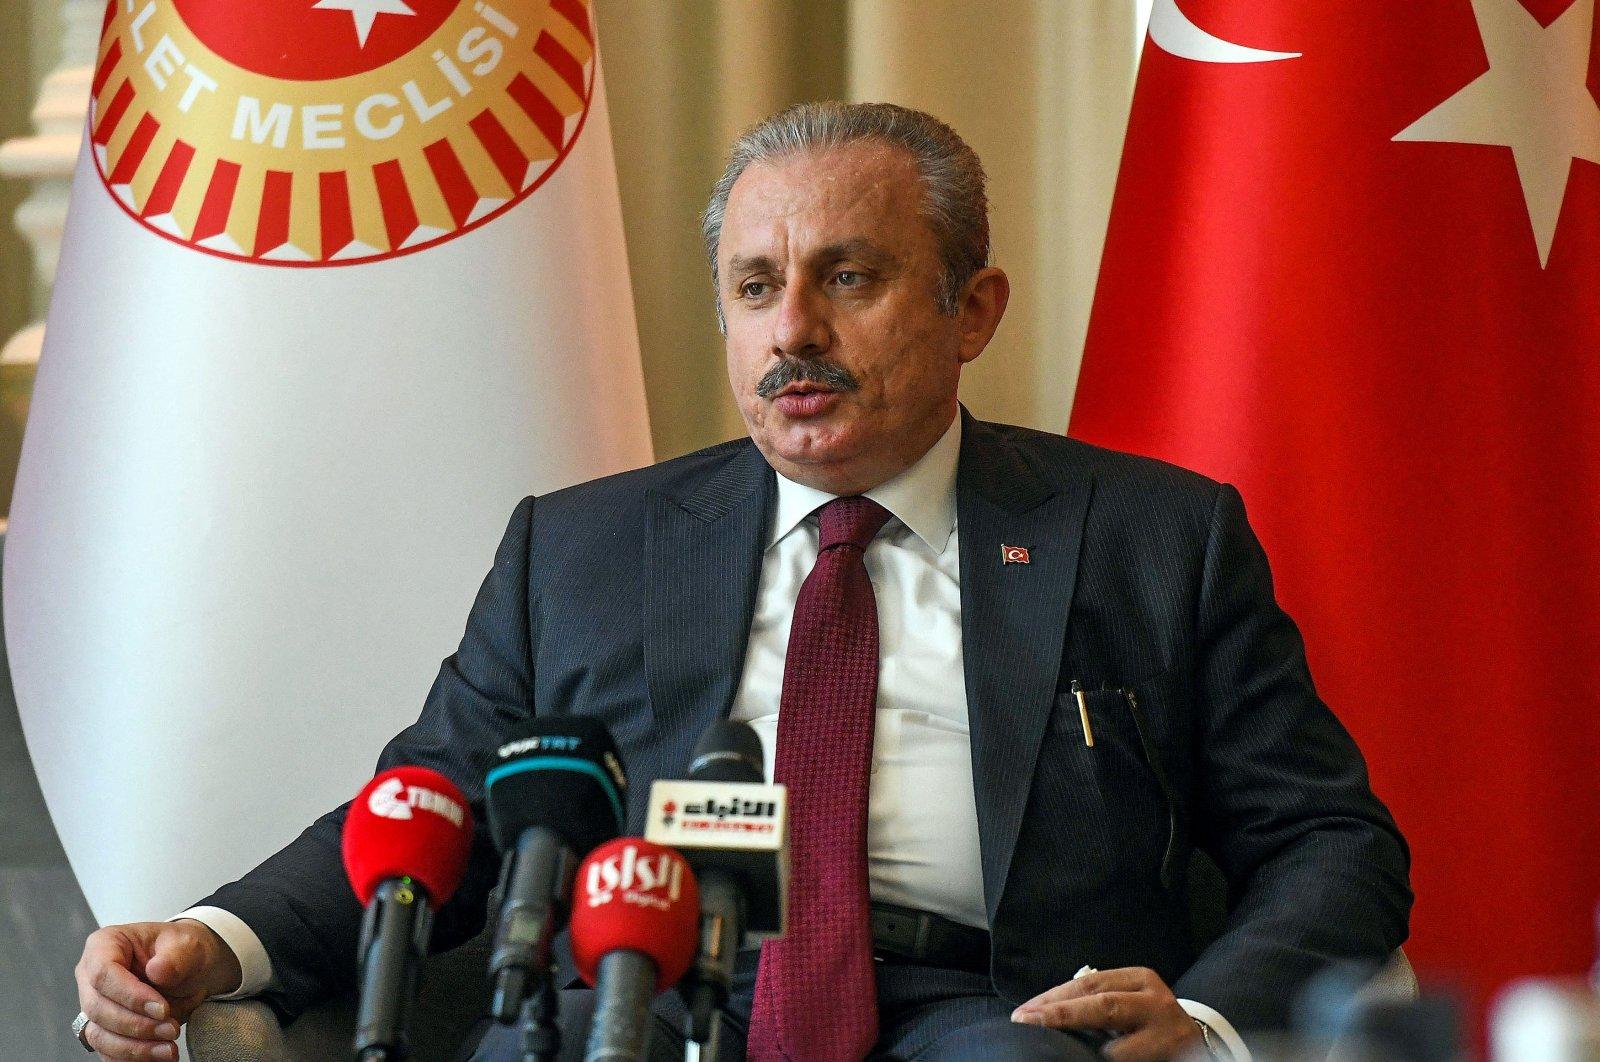 Turkey's Parliament Speaker Mustafa Şentop holds a news conference in Kuwait City on July 13, 2021. (AFP File Photo)